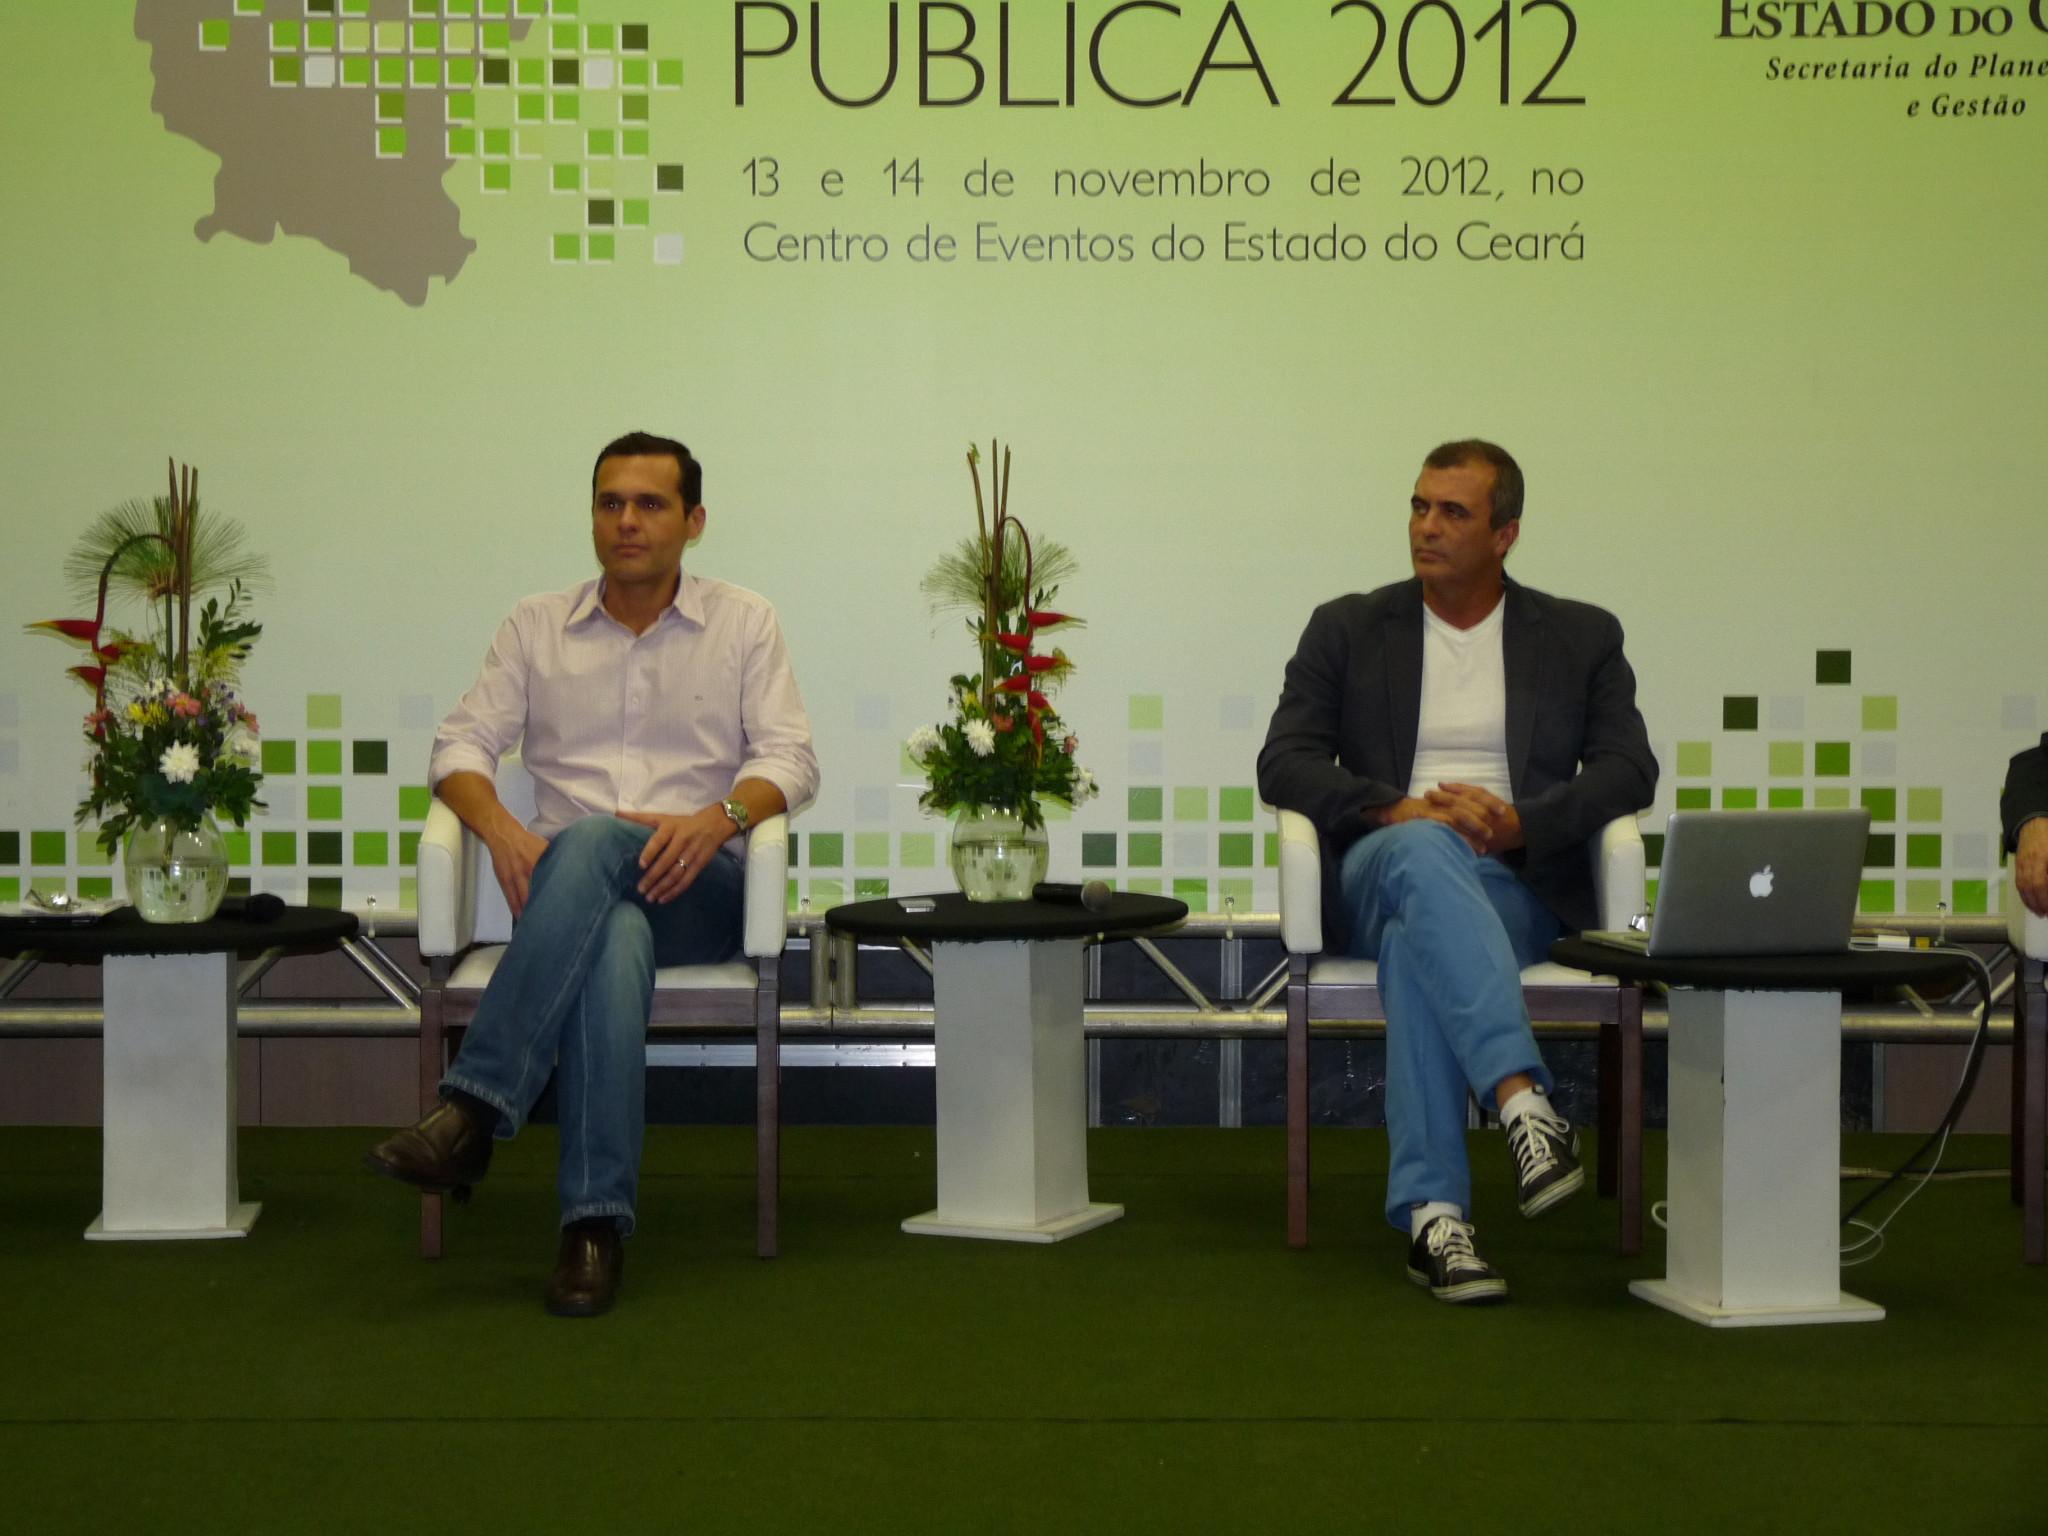 Palestra de Paulo Barros encerra Congresso de Gestão Pública 2012